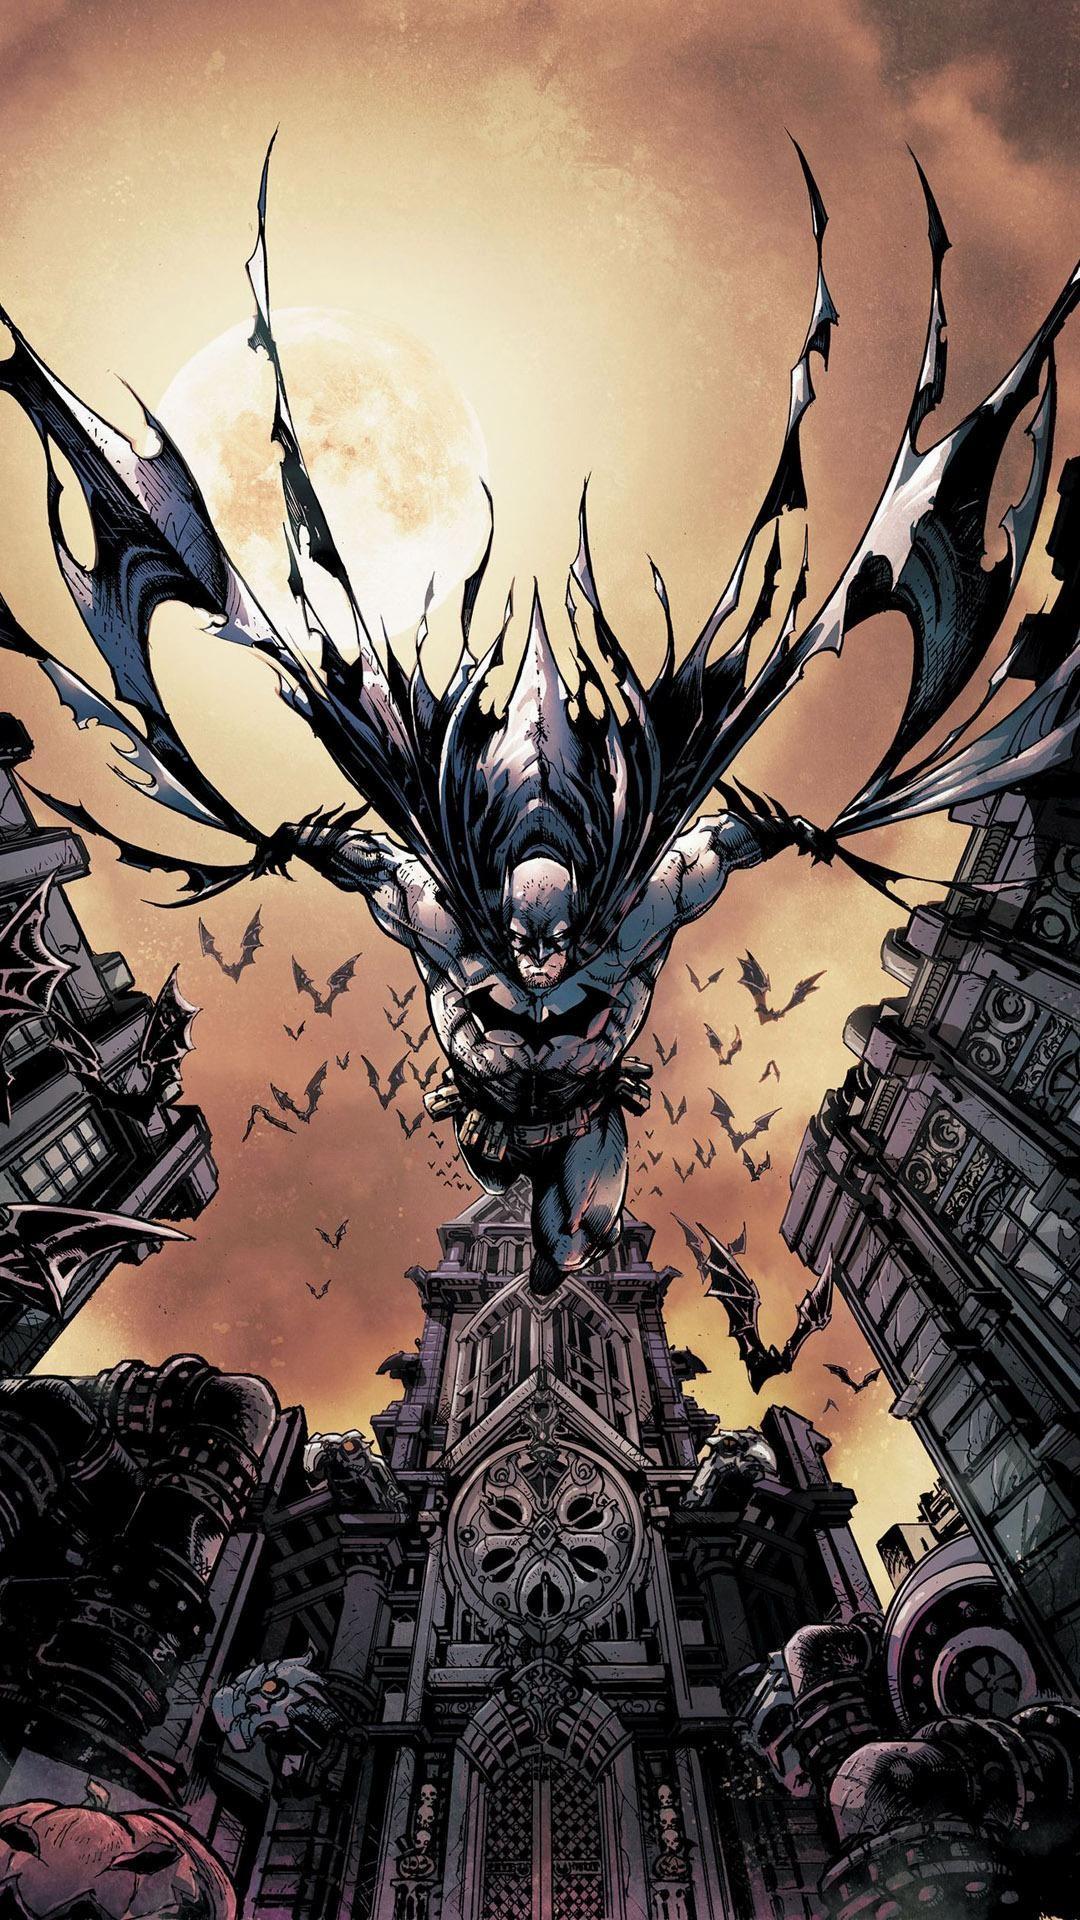 wallpaper.wiki-Download-Free-Dc-Comics-iPhone-Wallpaper-